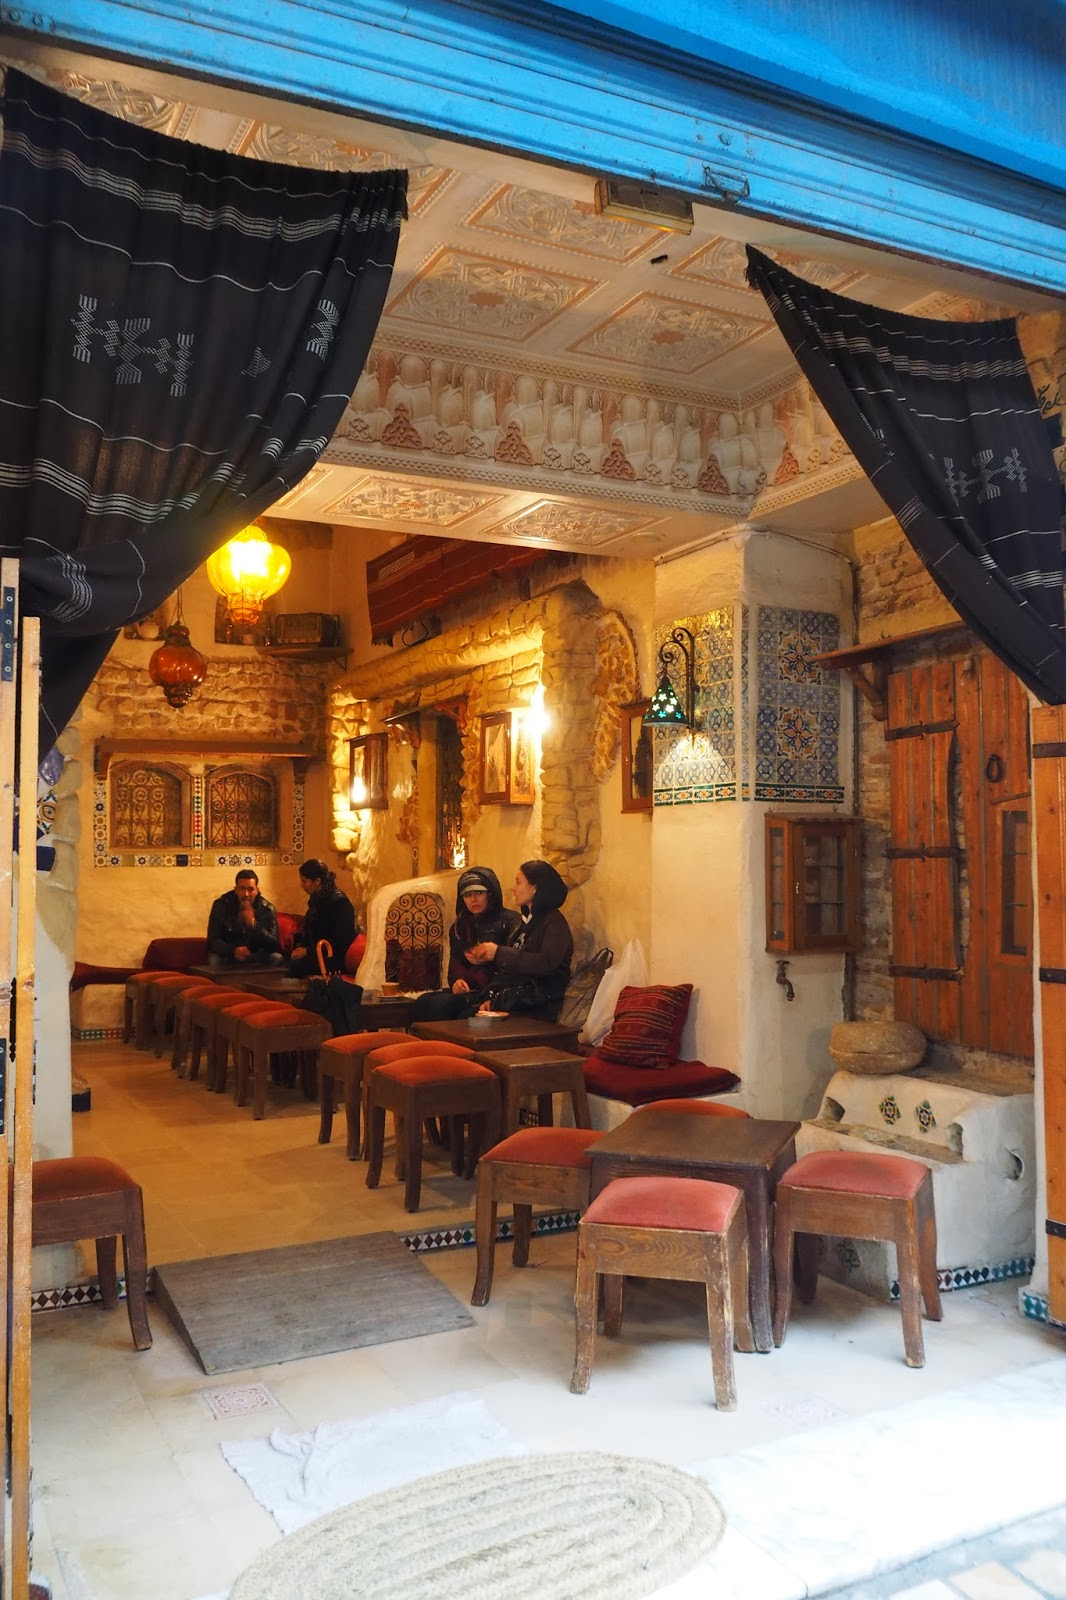 El Zorro Tunisian Tour 3 The Medina Of Tunis 突尼西亞之旅 3